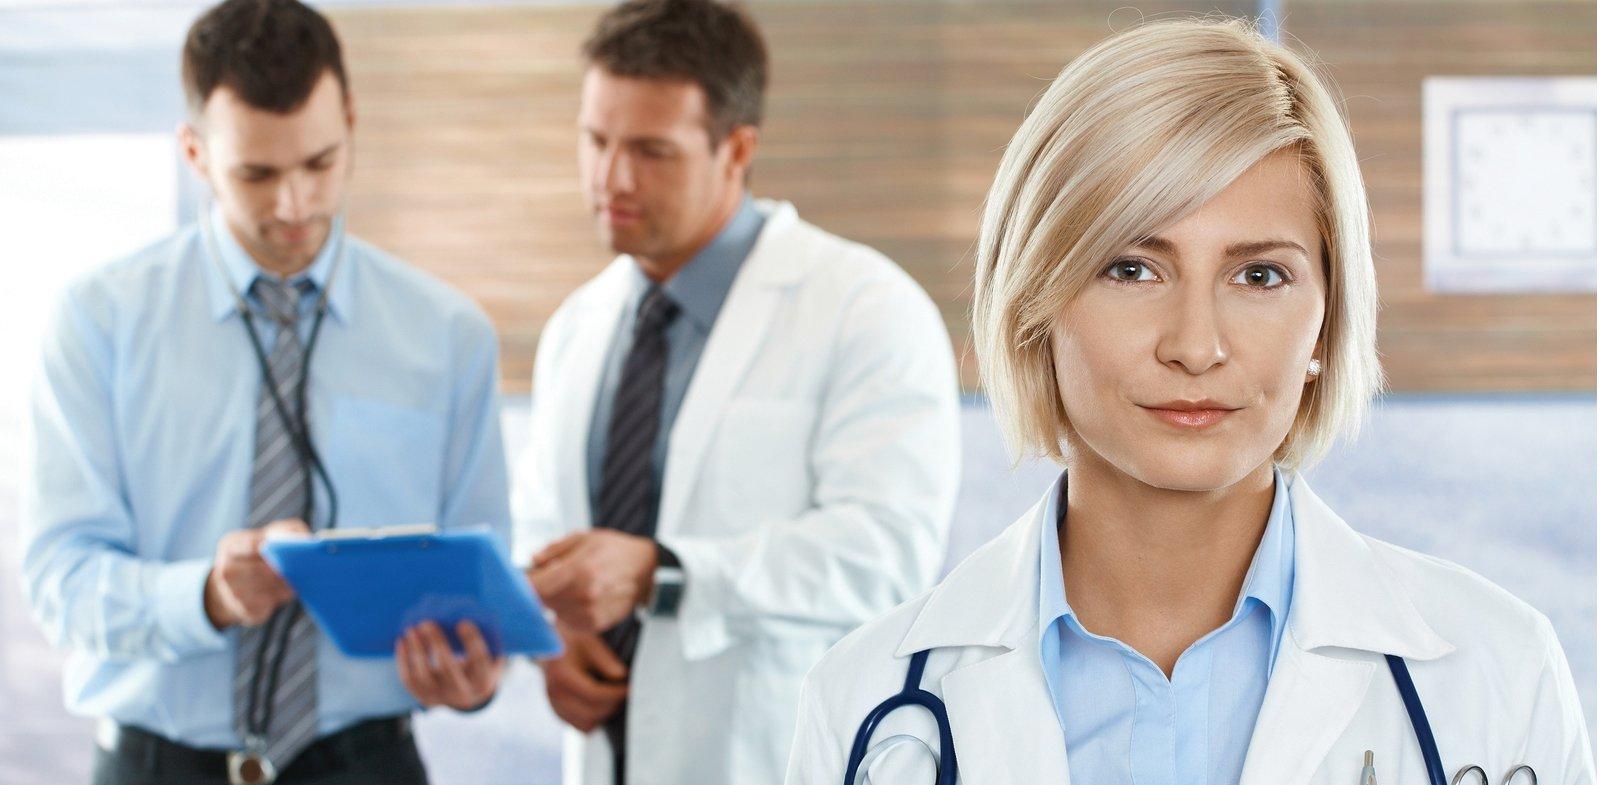 high blood pressure doctor